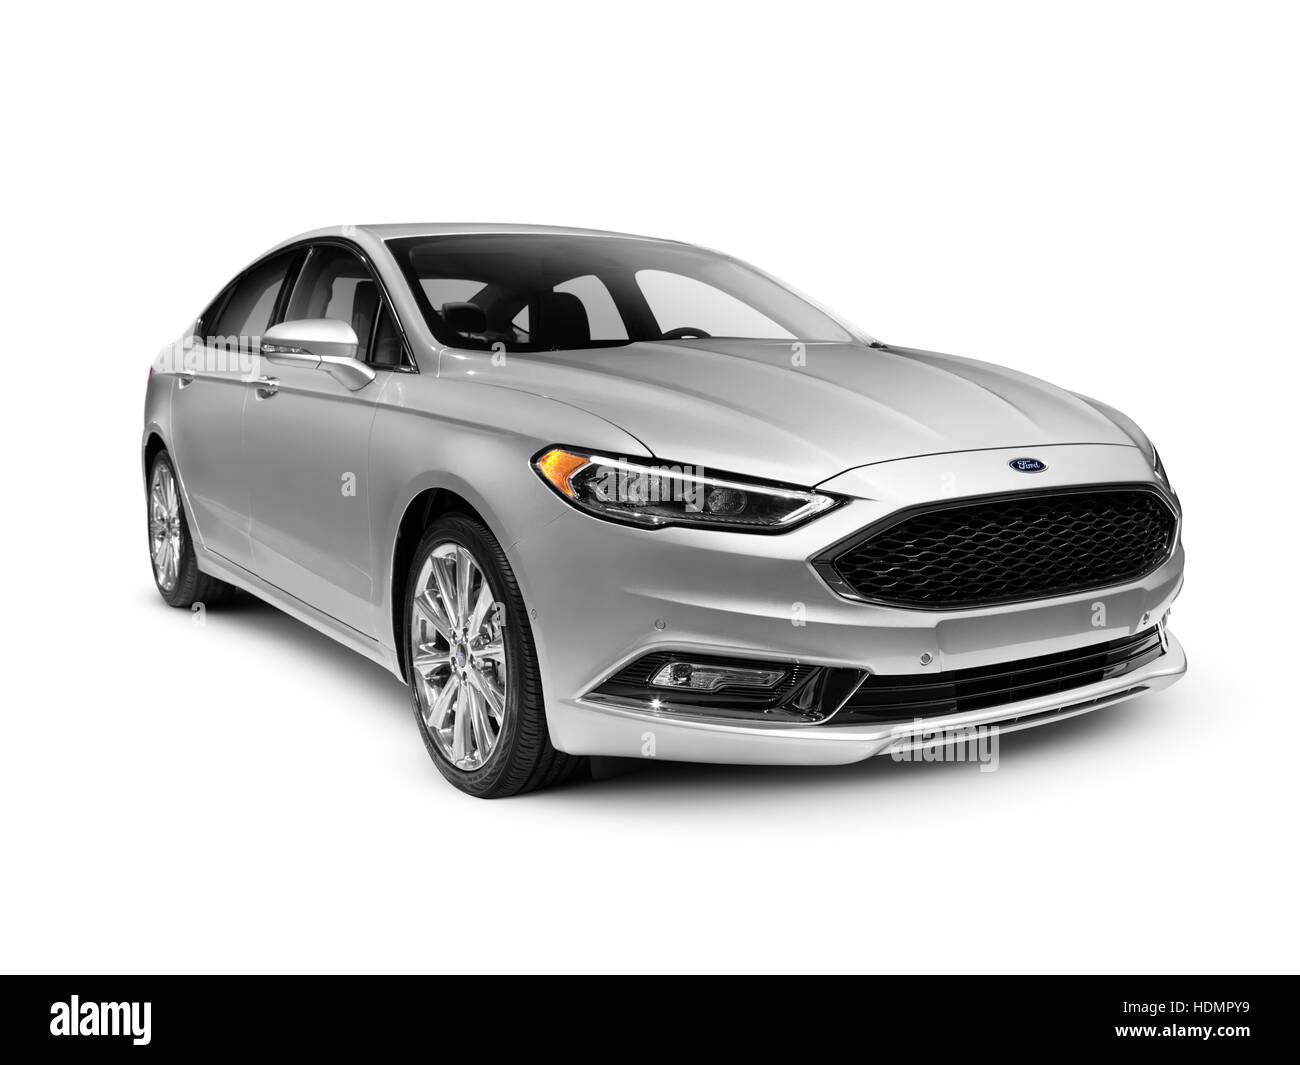 Ford fusion mid size silver sedan car 2017 stock image